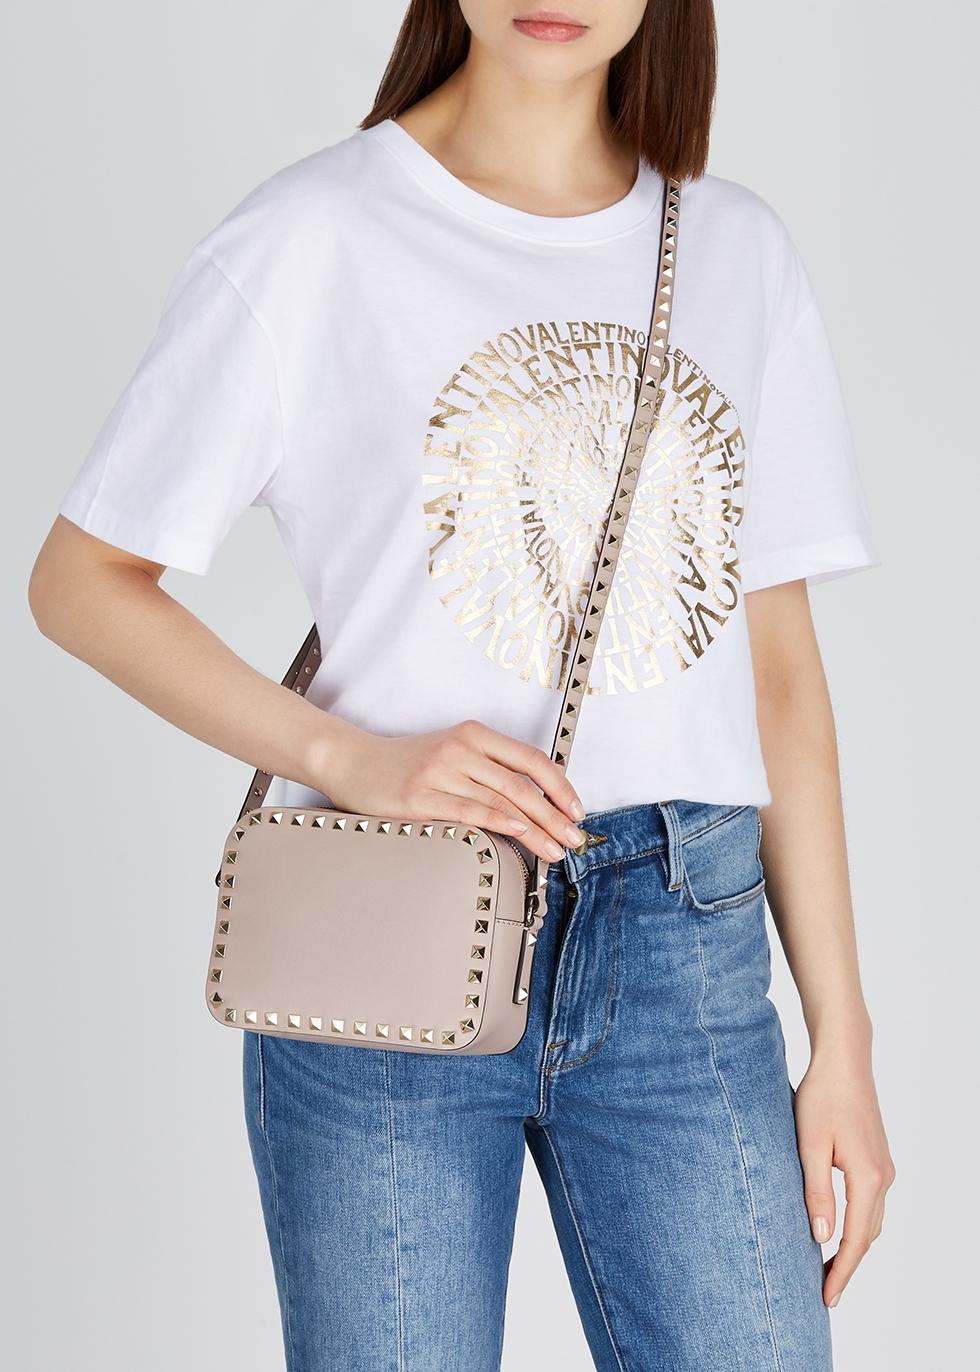 52990e44ee80 Women's Designer Bags, Handbags and Purses - Harvey Nichols